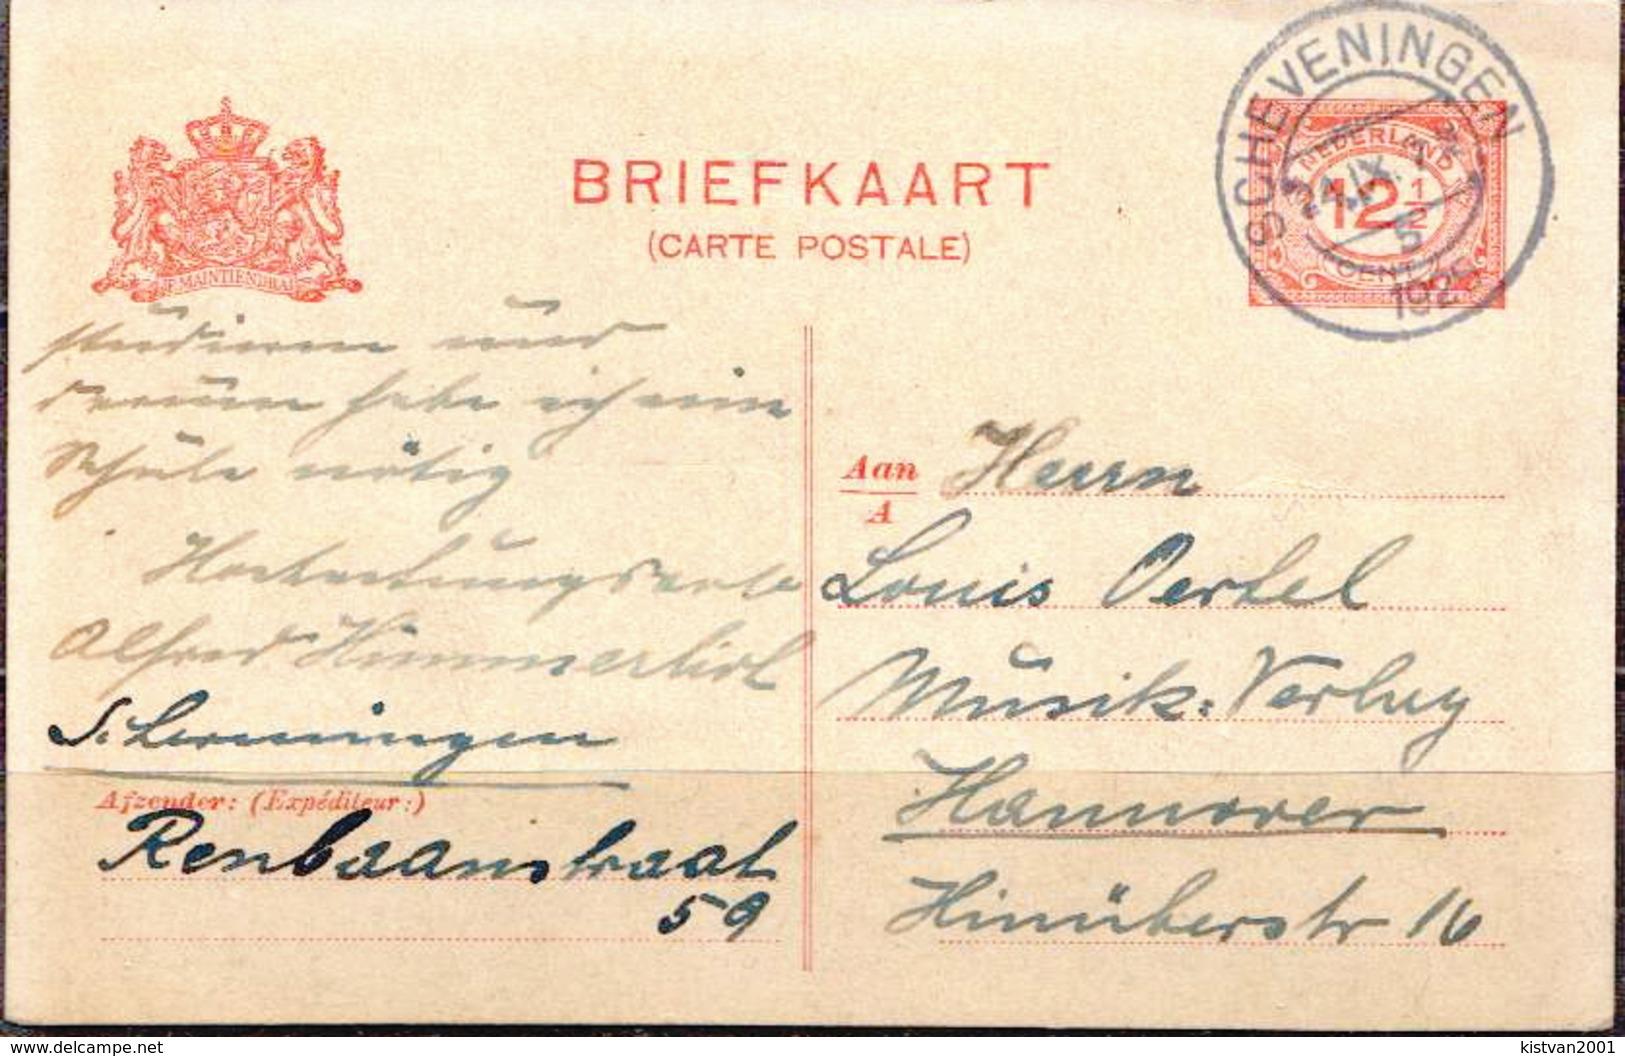 Postal History: Netherlands Postal Stationary From 1925 - Postal Stationery